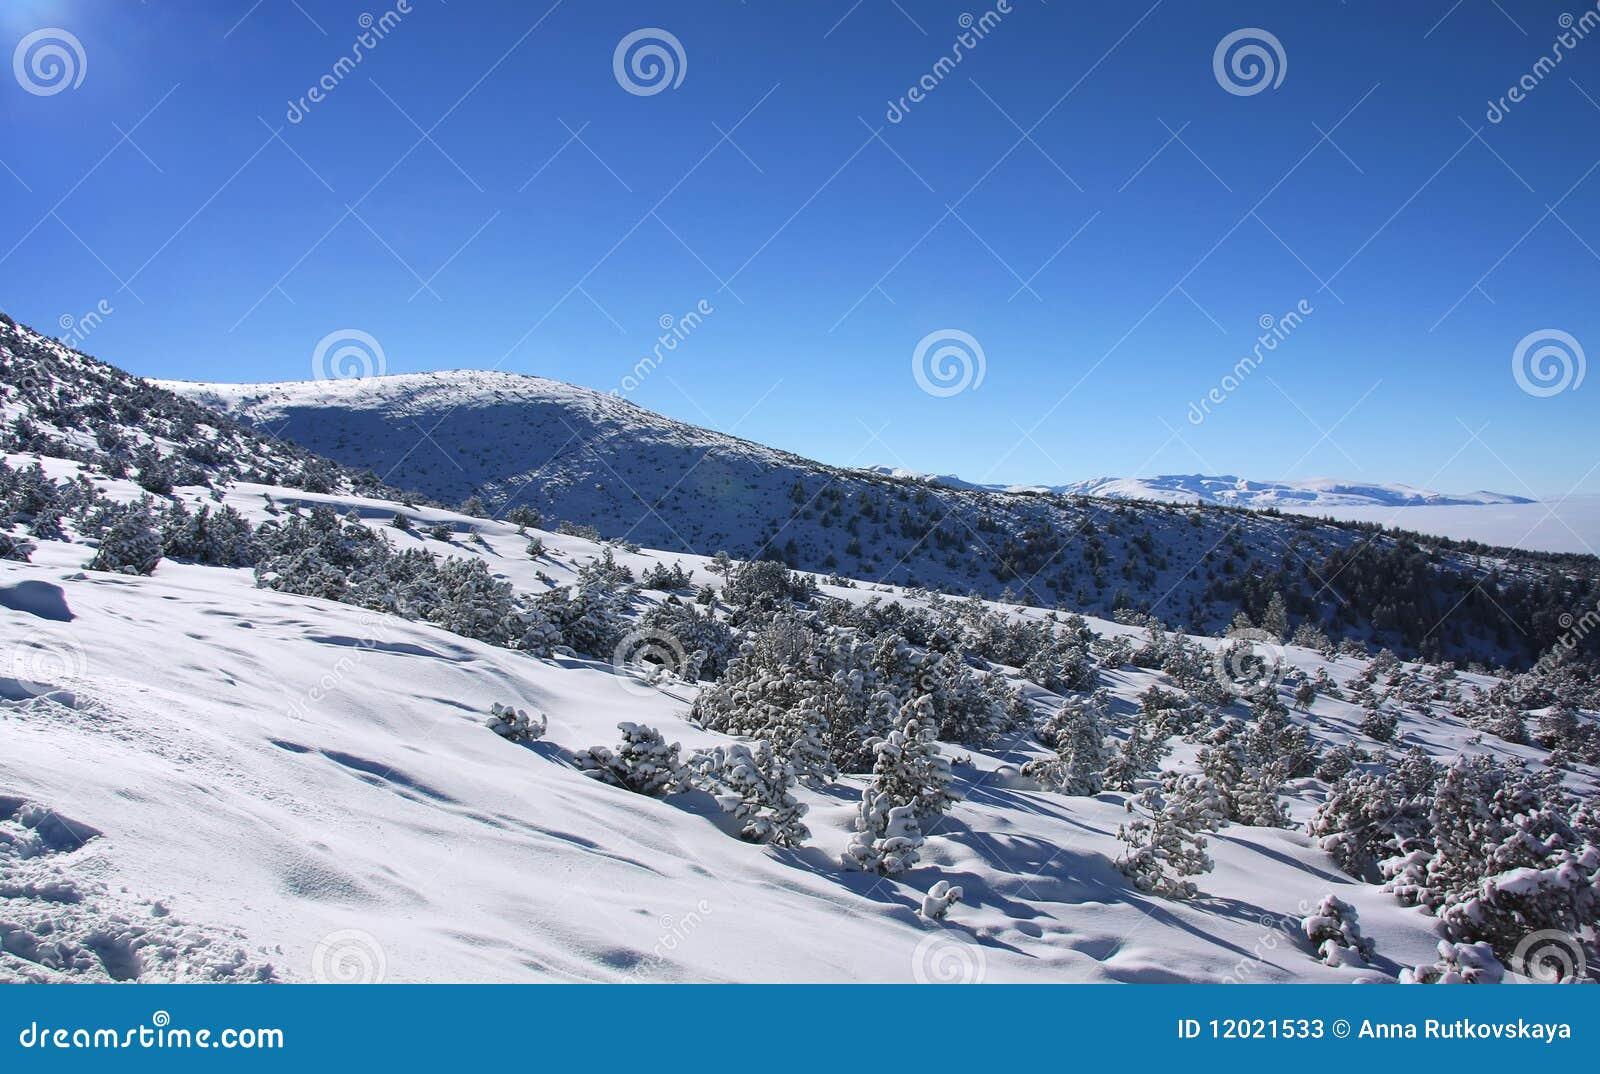 Borovets Bulgaria  City pictures : Rila Mountains In Borovets, Bulgaria Stock Photos Image: 12021533